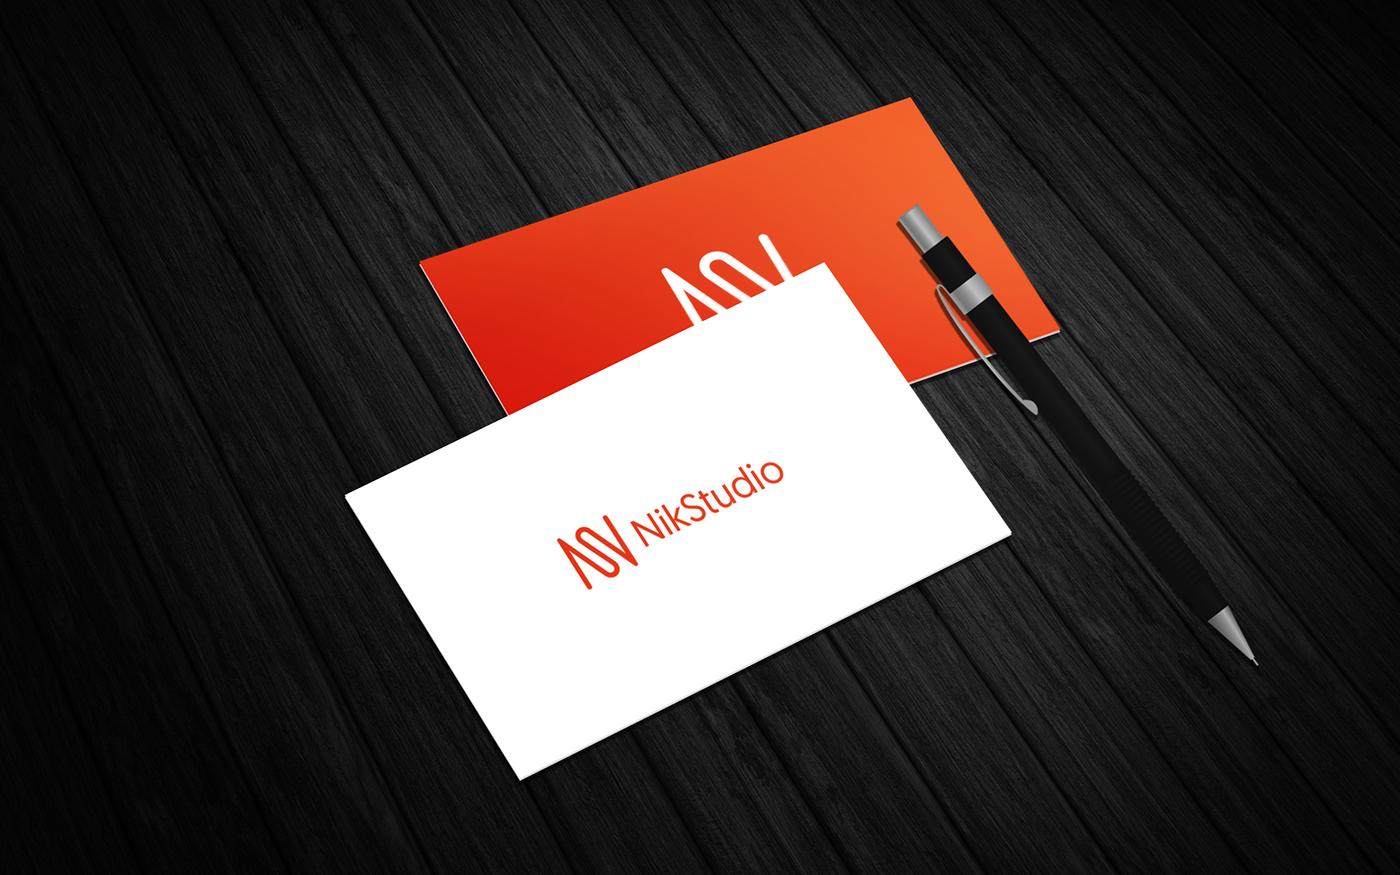 Mockup free enjoy businesscard Perspective nikstudio